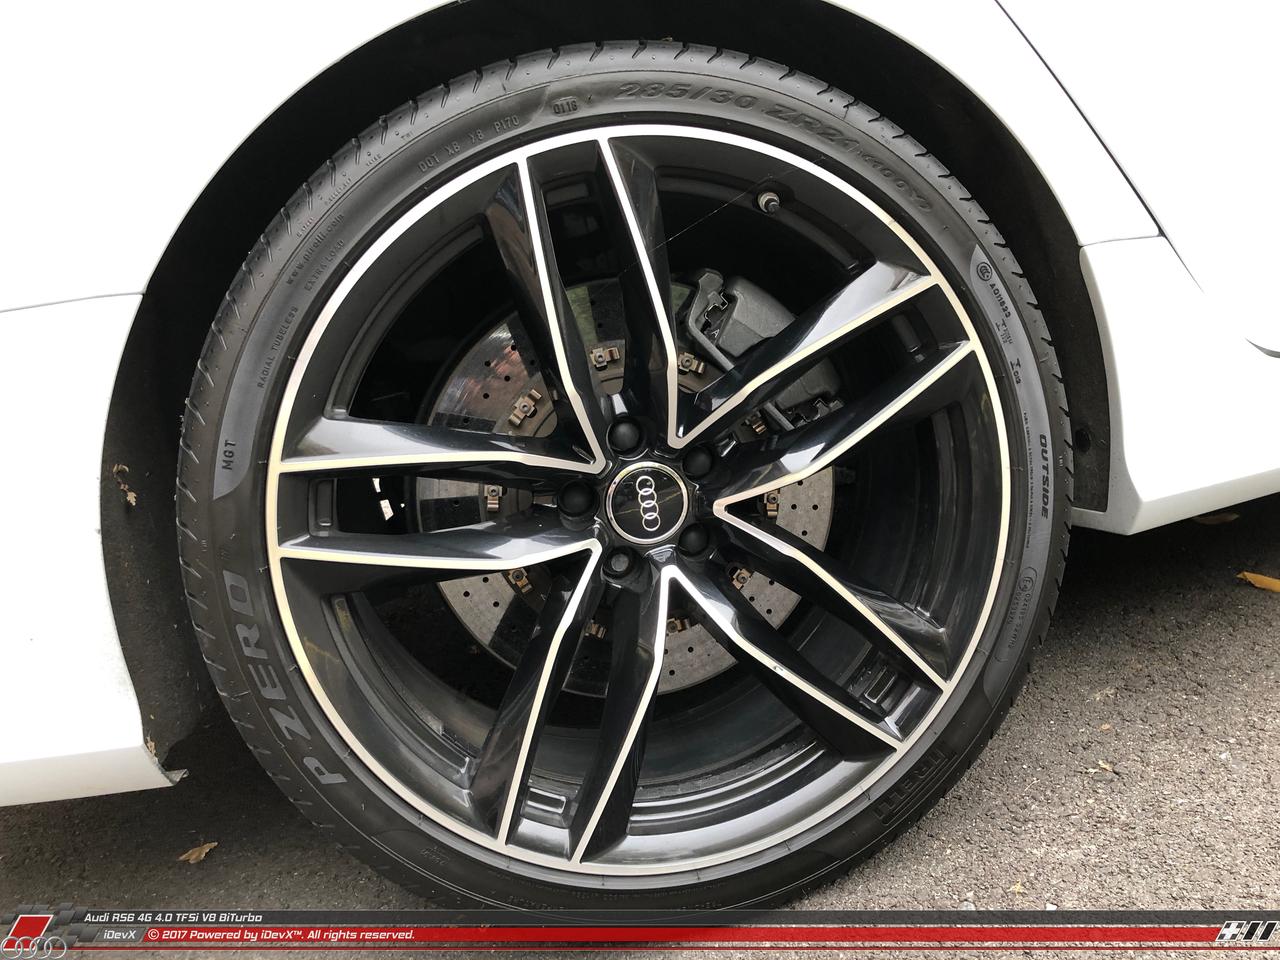 10_11.2018_Audi-RS6_iDevX_020.png